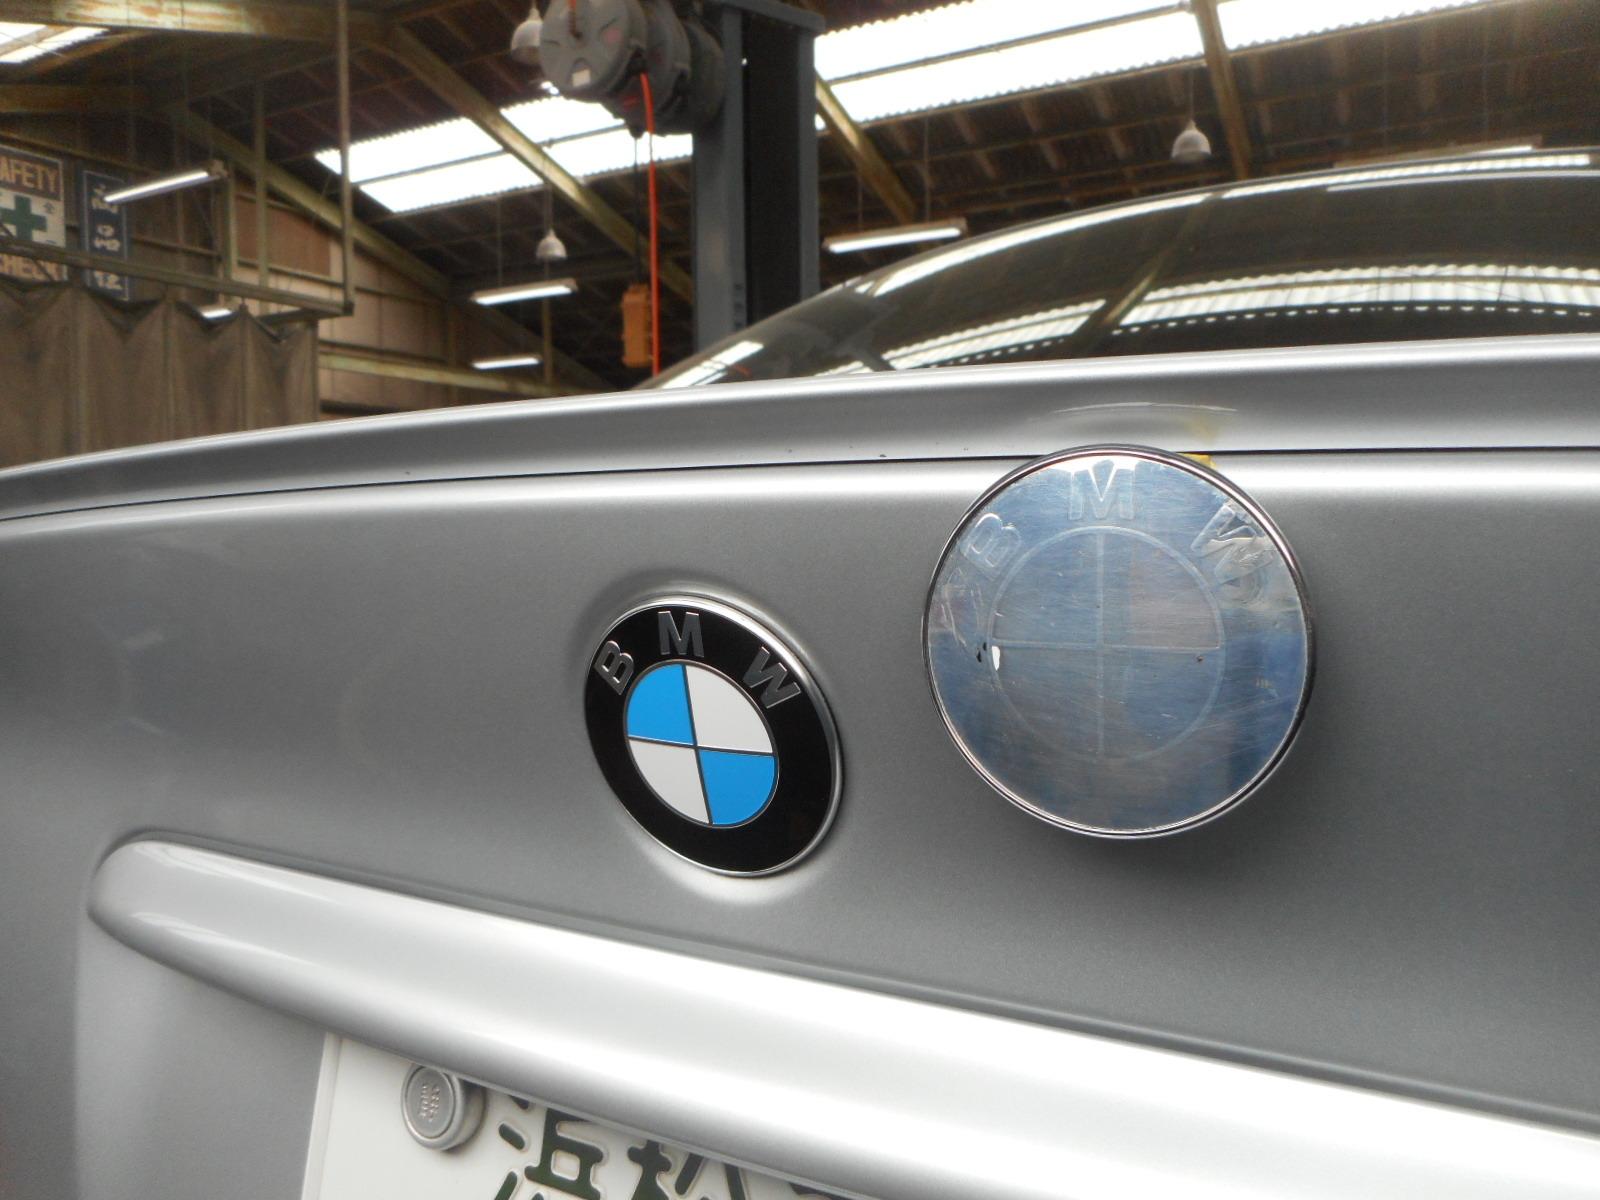 BMW 318i (E46) エンジンオイル漏れ 修理(オイルパンガスケット交換)_c0267693_15400090.jpg